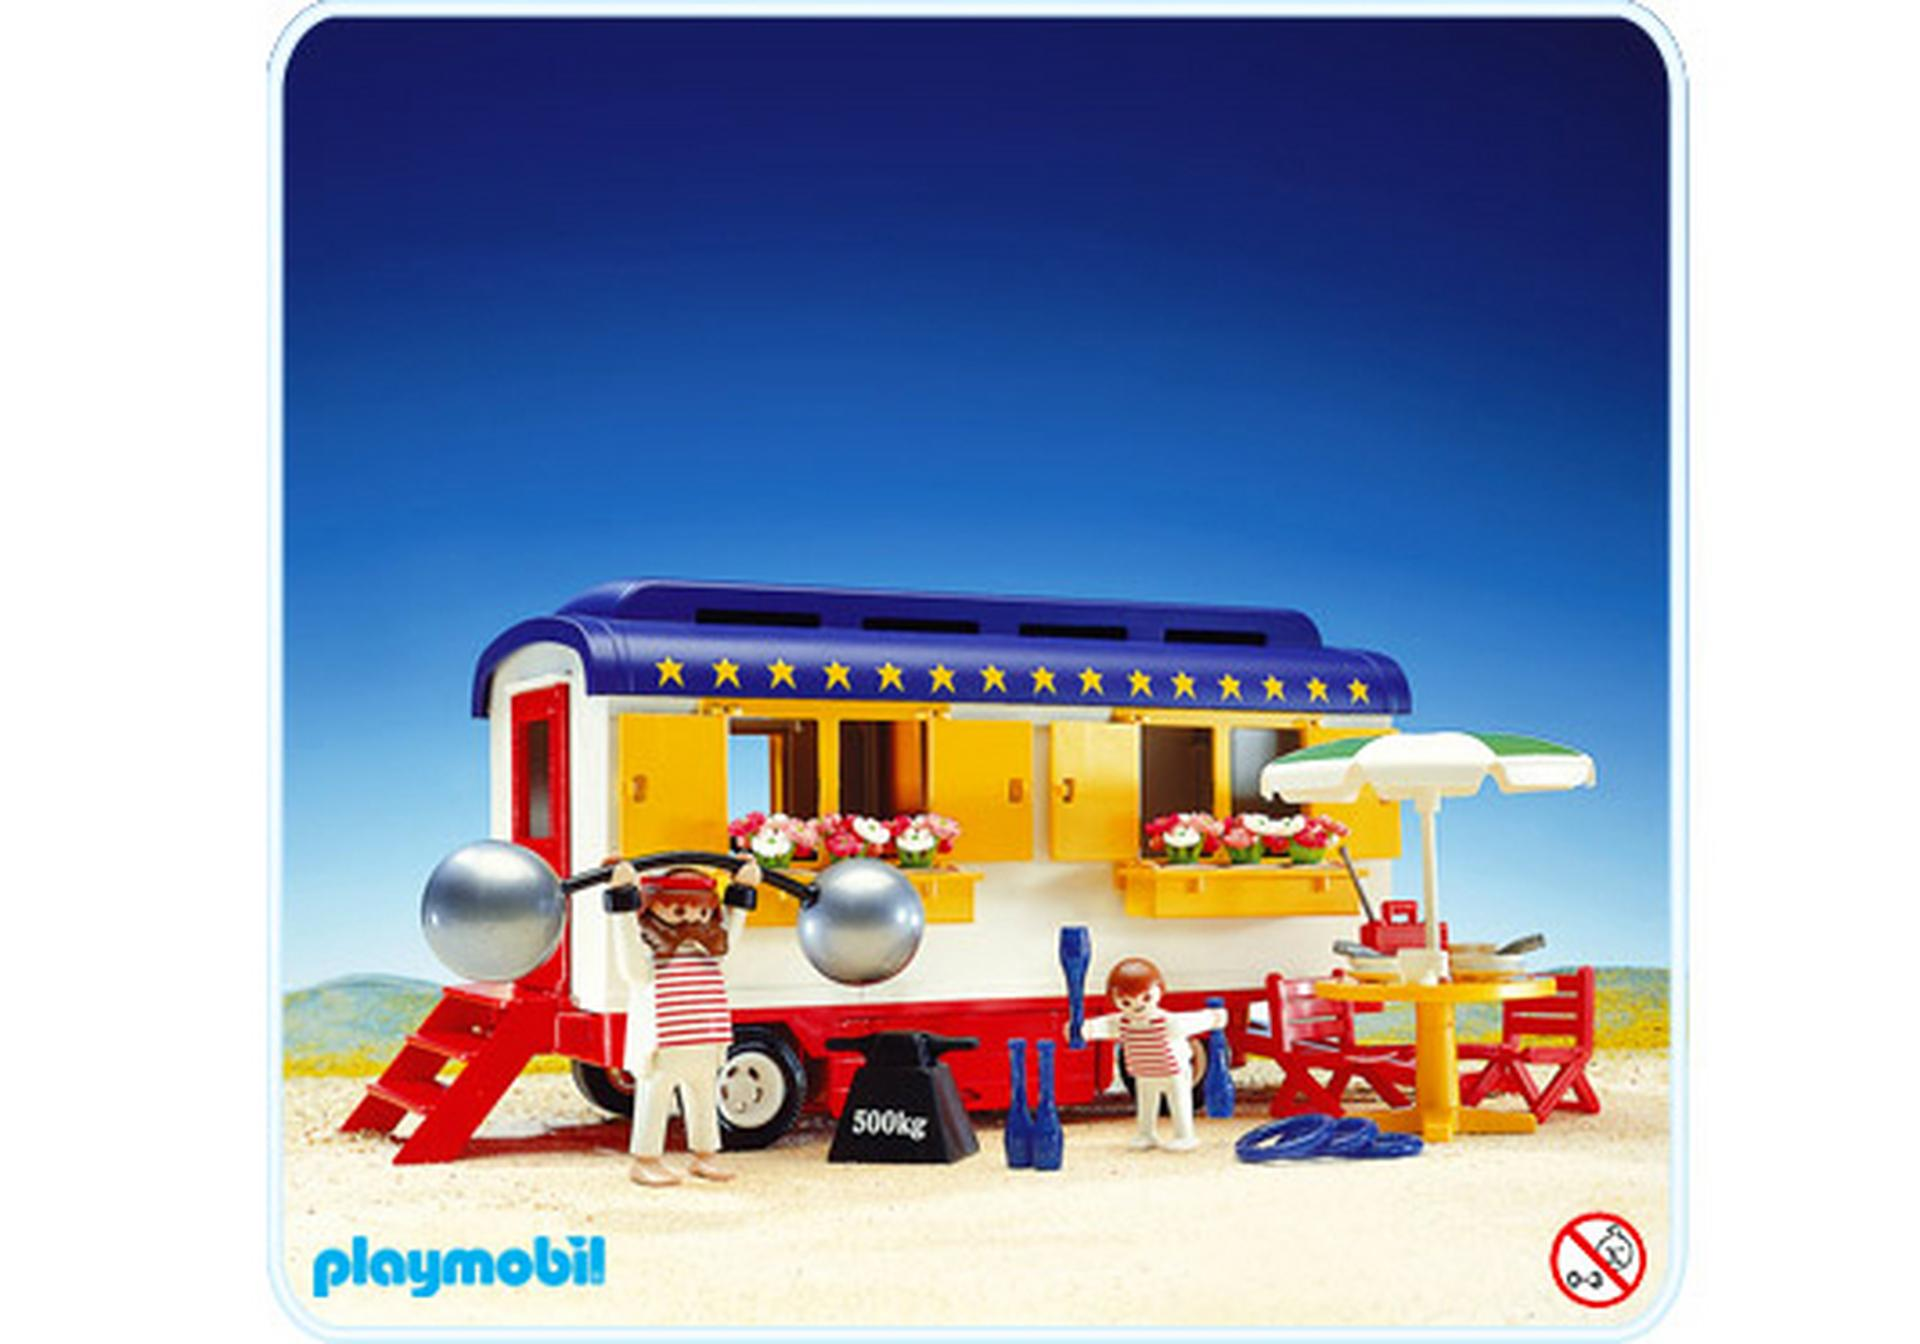 Roulotte de cirque 3728 a playmobil france - Cirque playmobil ...